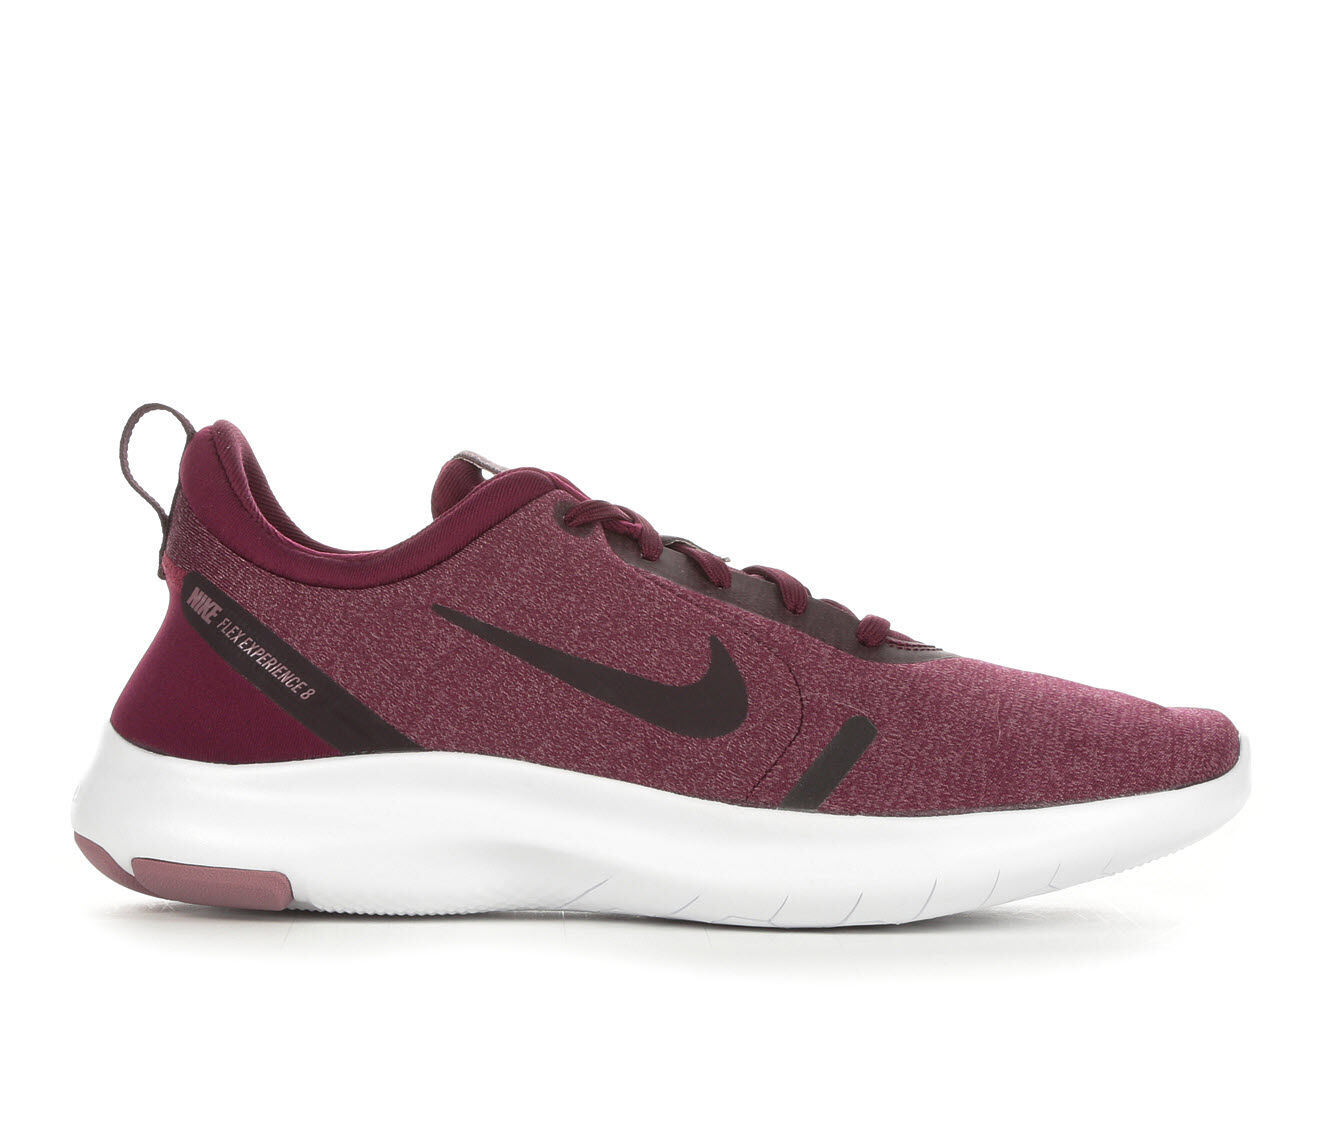 Women's Nike Flex Experience Run 8 Running Shoes Burg Ash/Plum